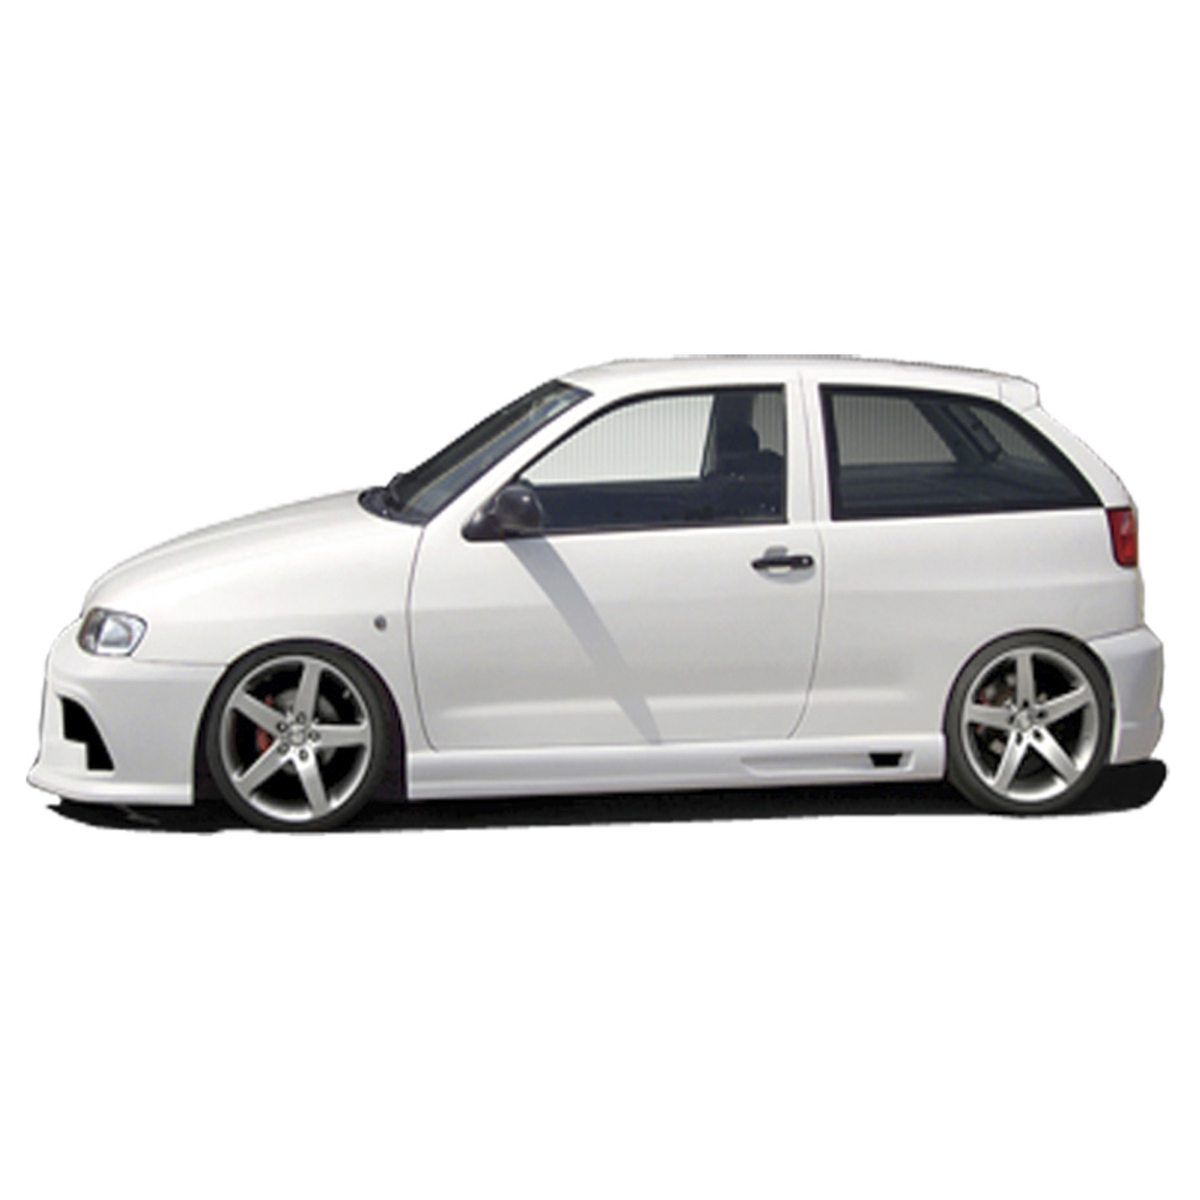 Seat-Ibiza-2000-Terminator-Emb